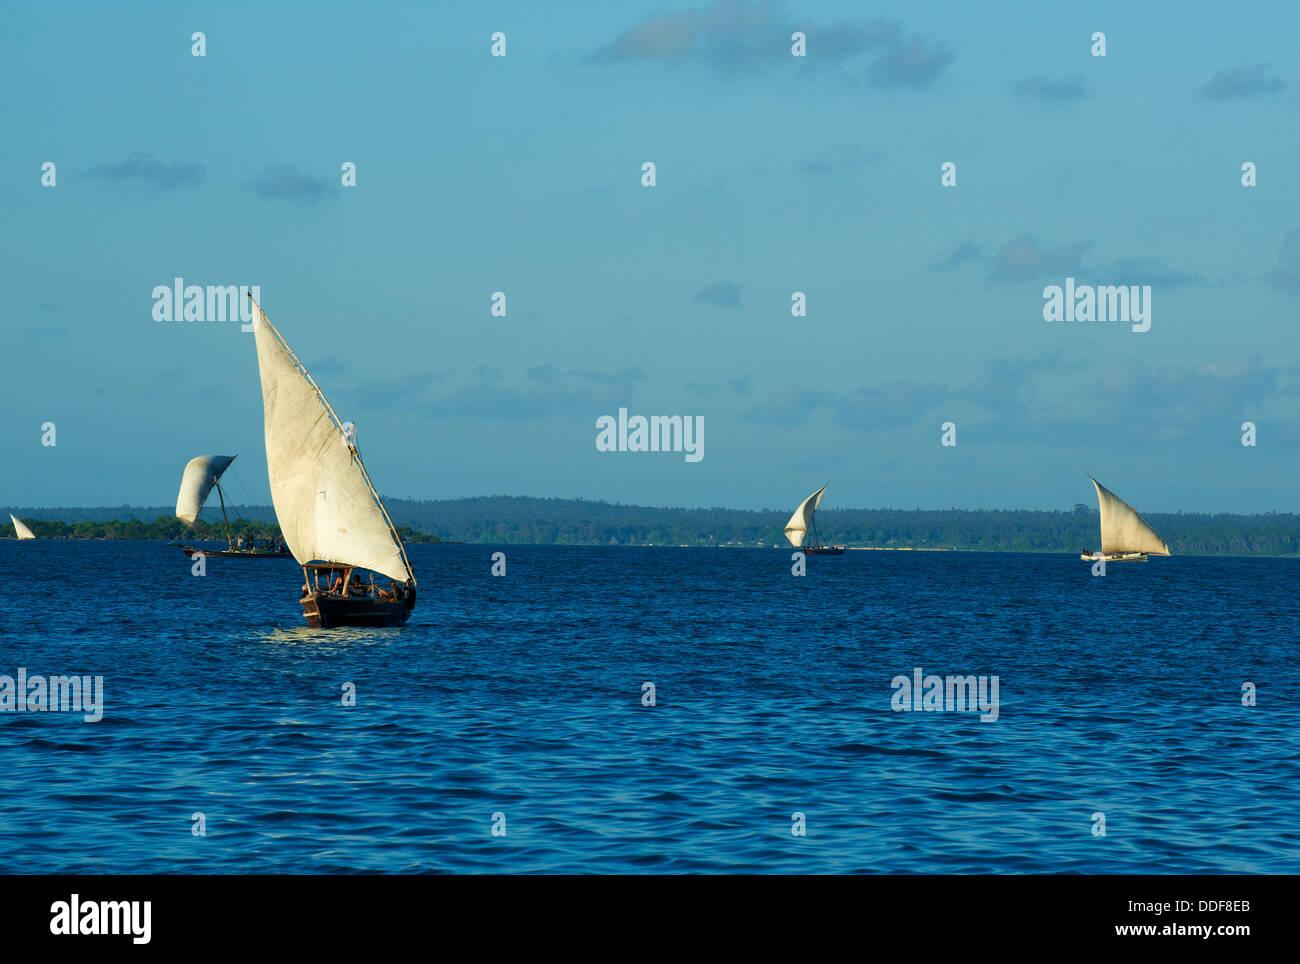 Tanzania, Zanzibar island, Unguja - Stock Image